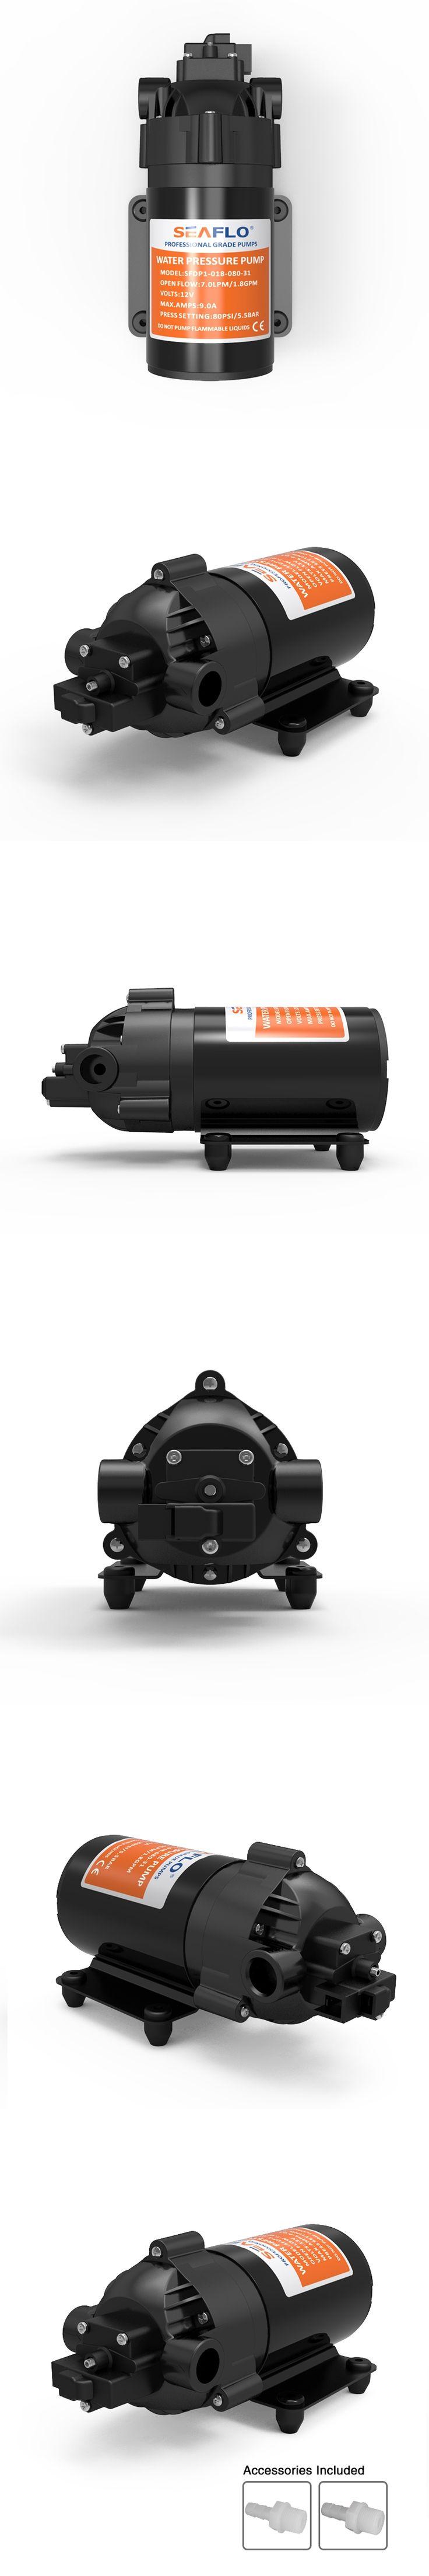 Best 25 diaphragm pump ideas on pinterest adjustable clamp seaflo marine boat pump 12v dc ce approved 70 lpm 80psi self priming diaphragm pump camper ccuart Choice Image